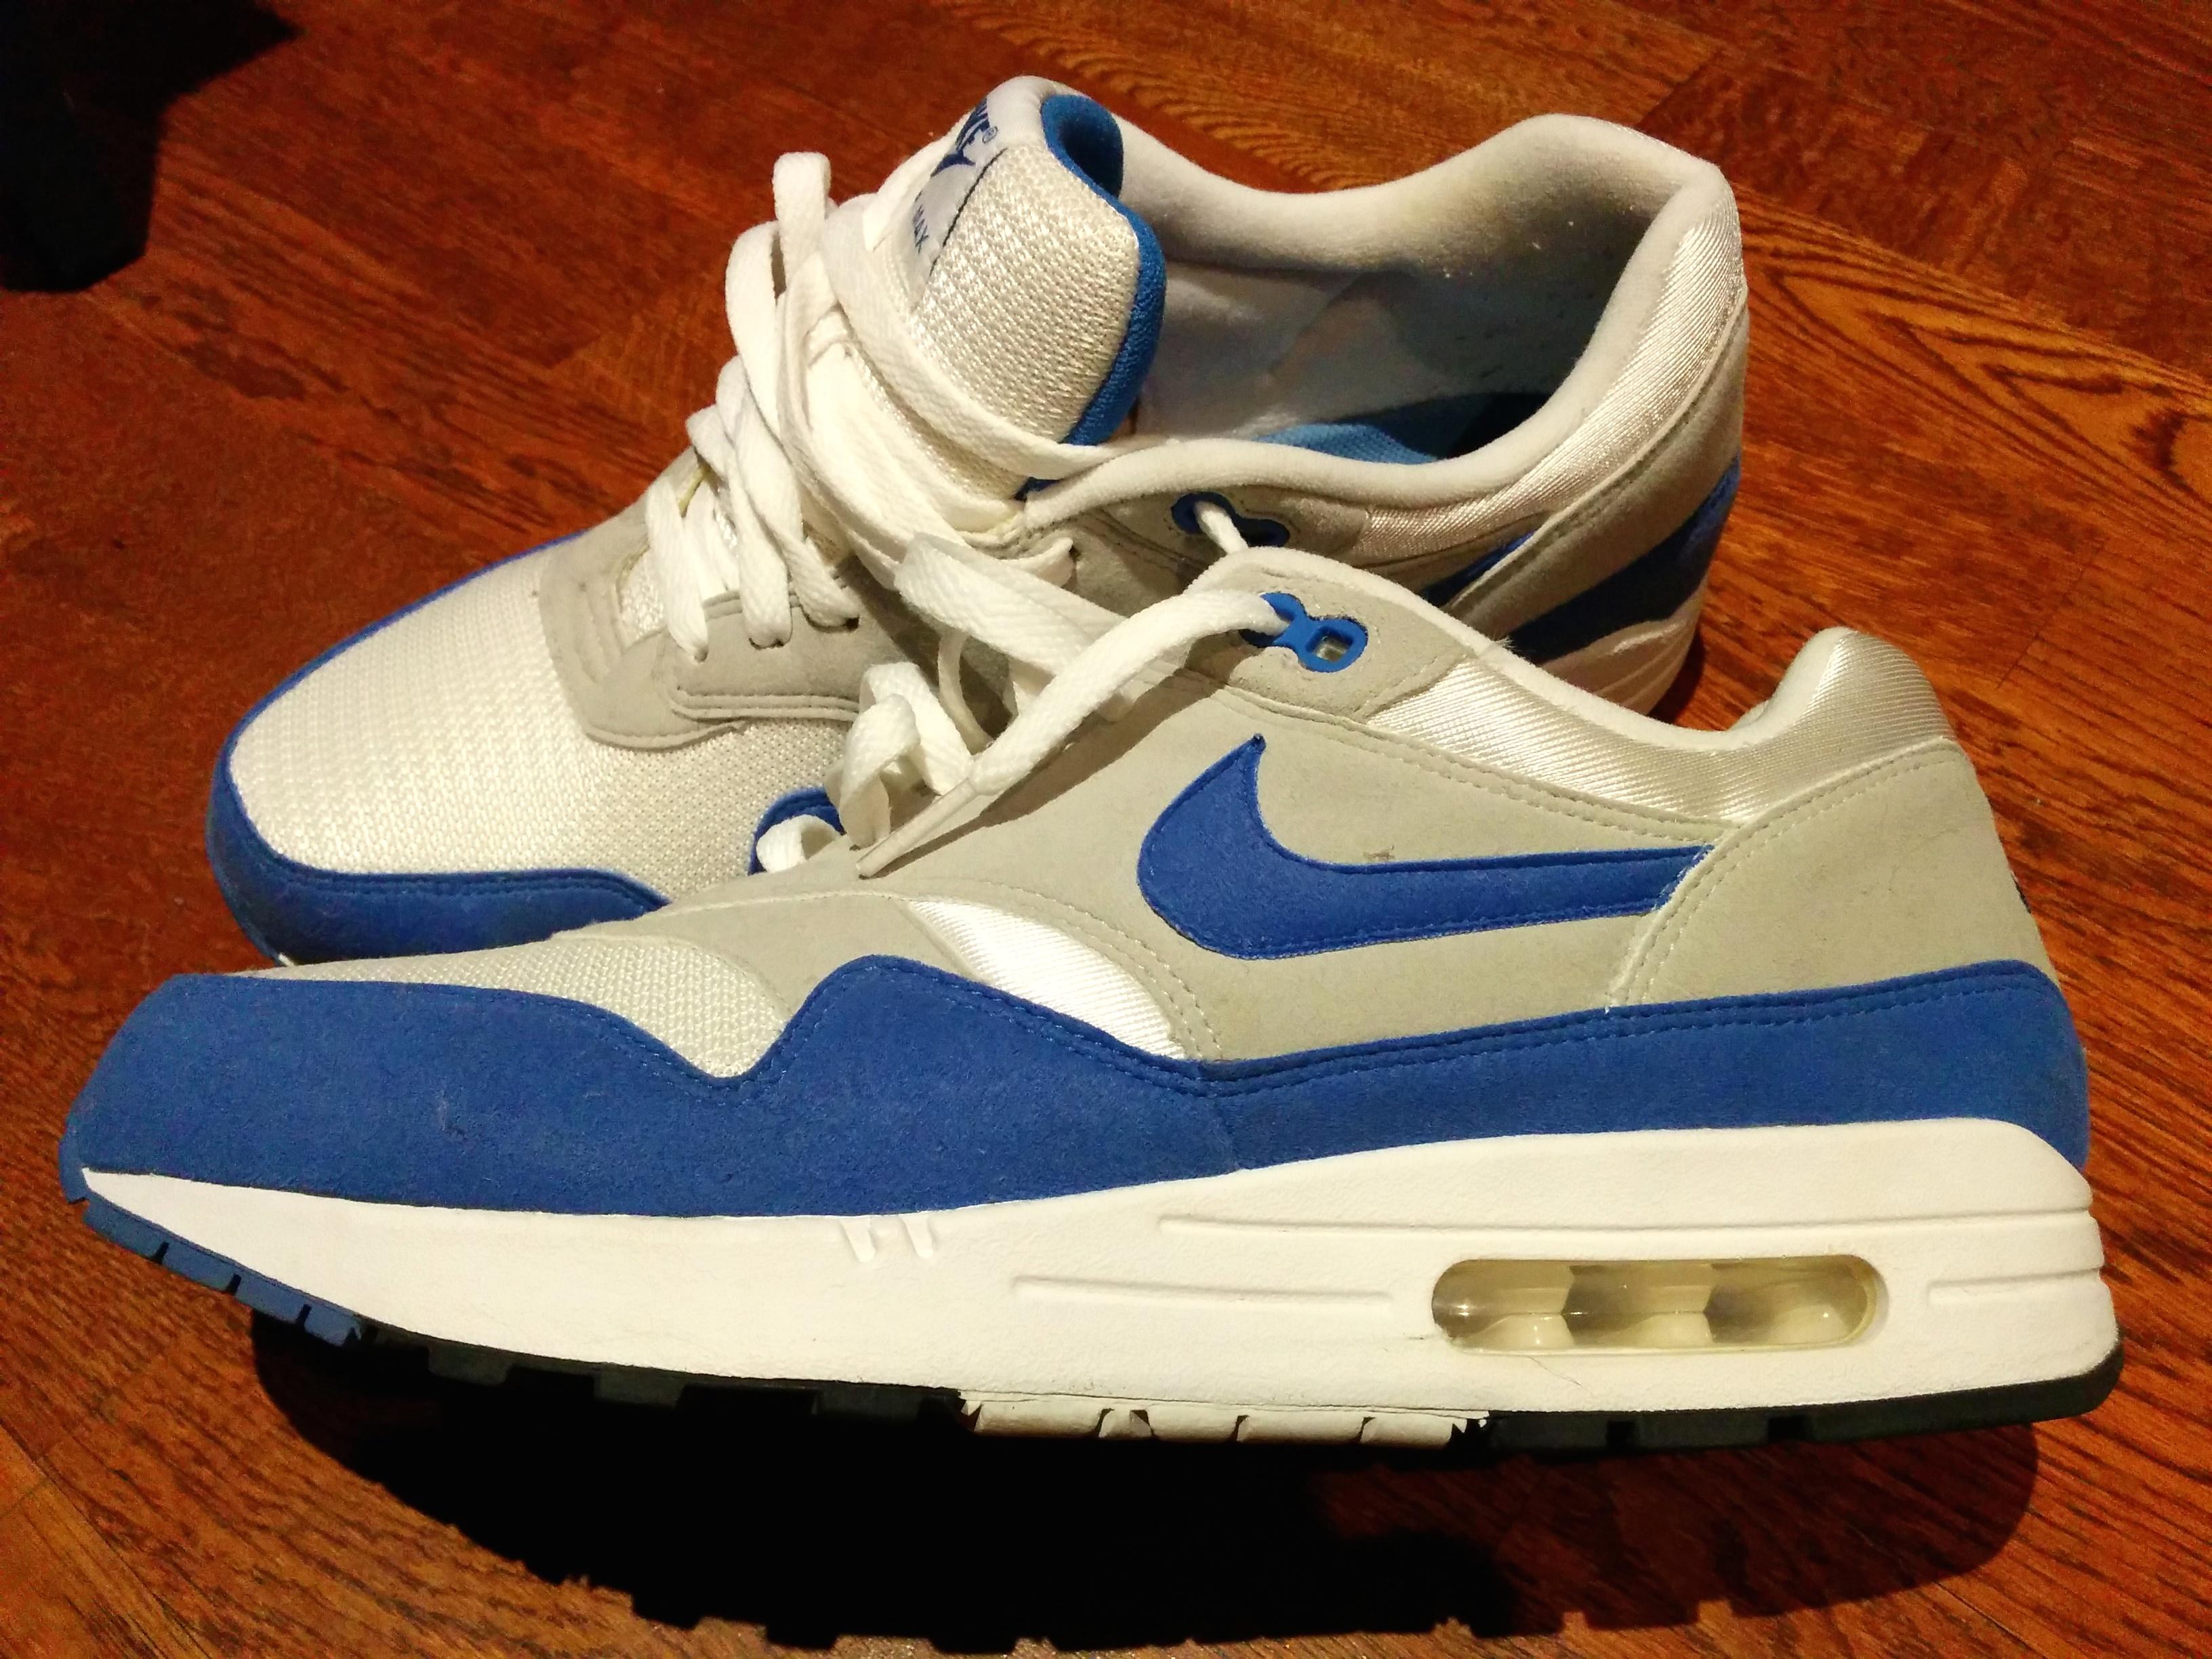 d6e4c9059f Nike Nike Air Max 1 White/varsity Blue-neutral Grey-white #378830 ...